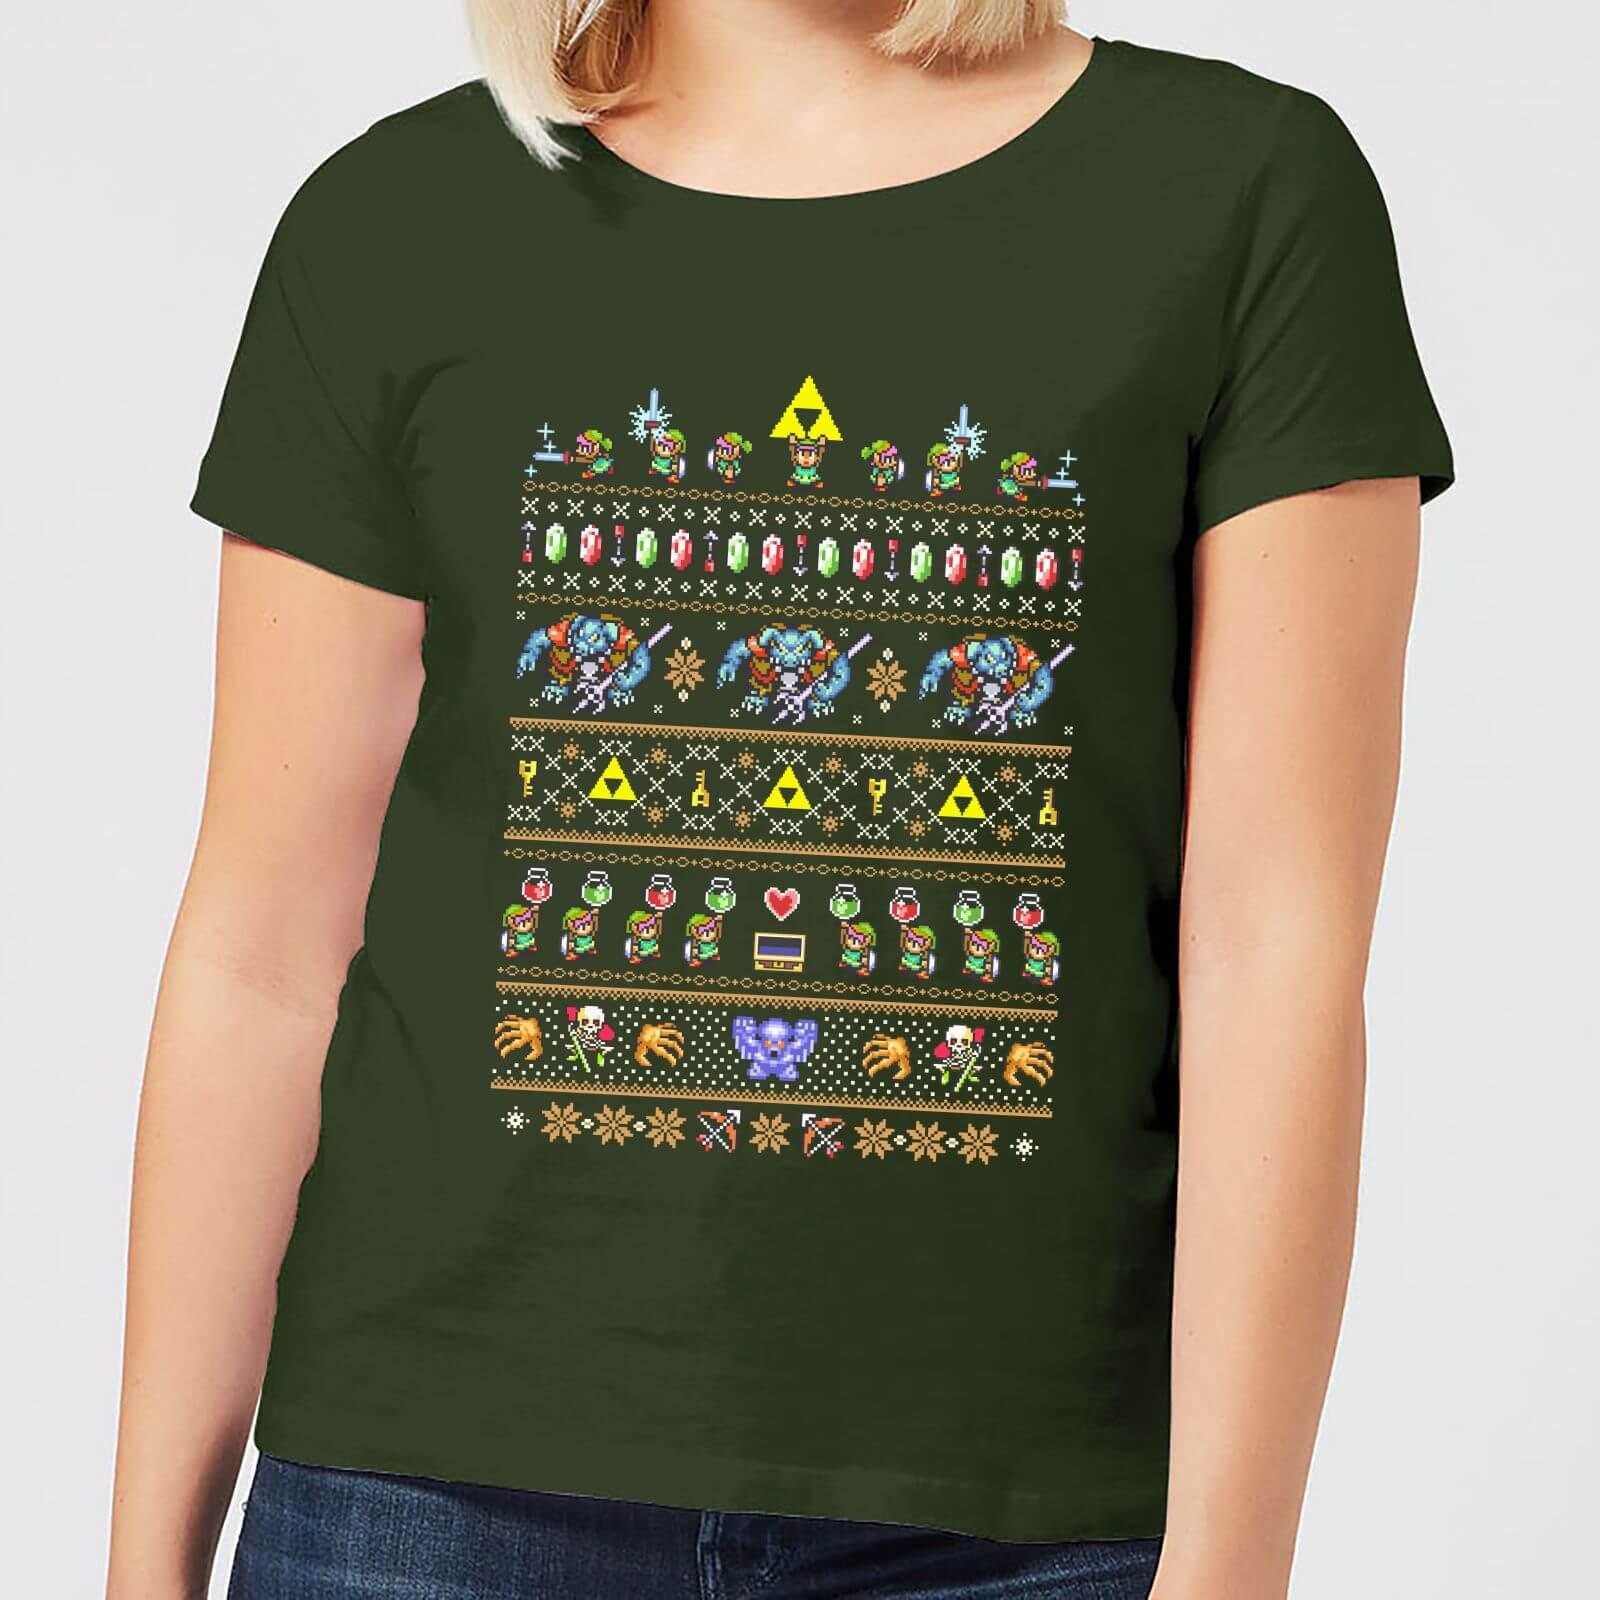 Nintendo Retro Women's Christmas T-Shirt - Forest Green - S - Forest Green